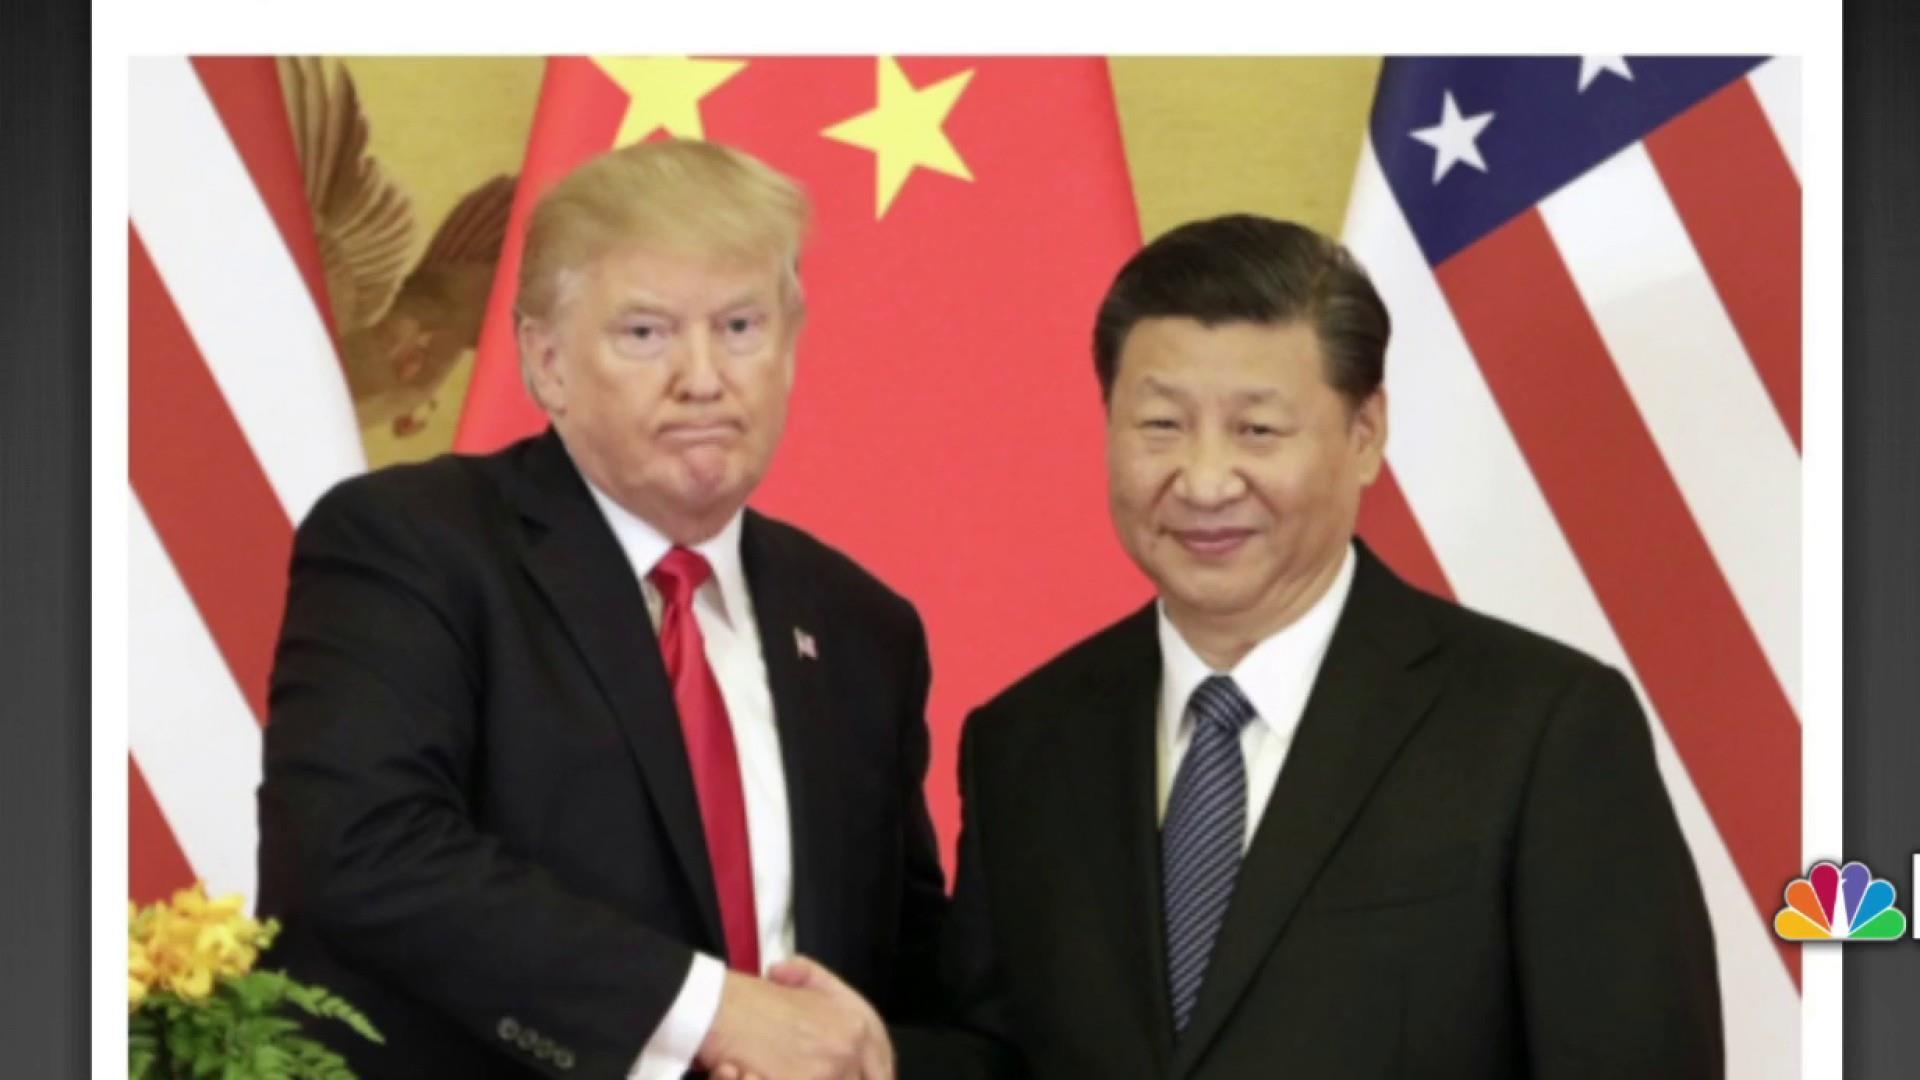 As Trump threatens tariffs, markets teeter